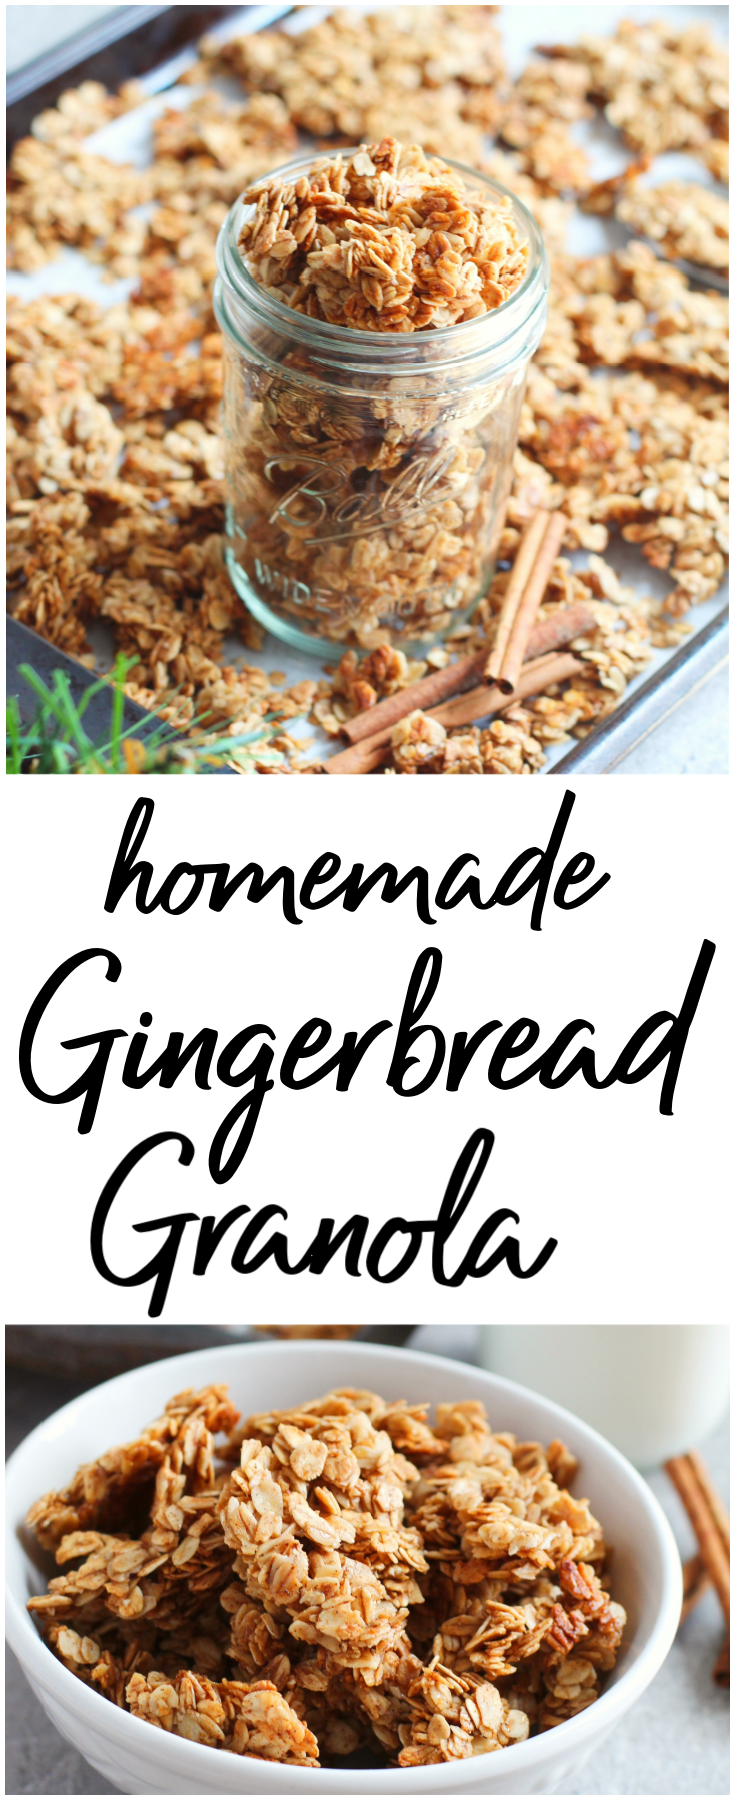 Homemade Gingerbread Granola